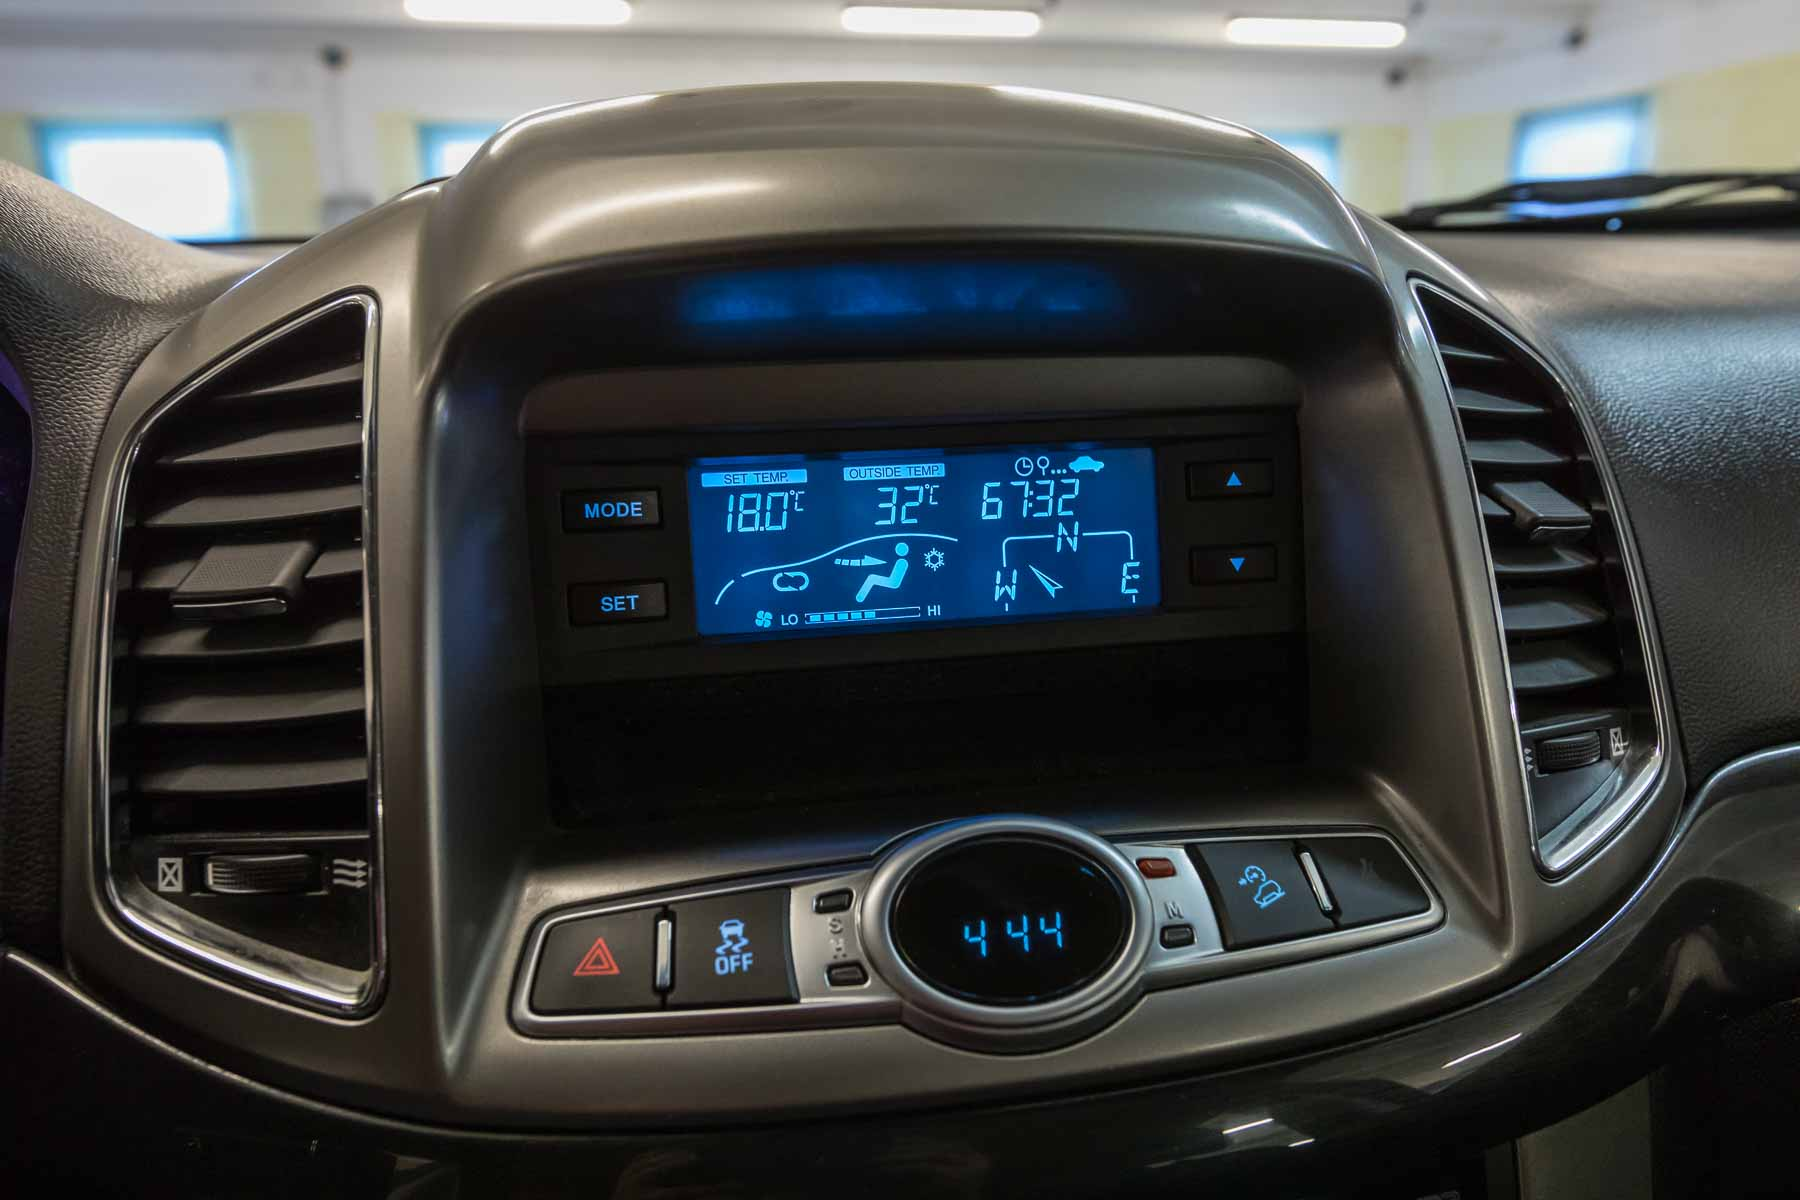 Chevrolet Interni Captiva Bianco 2wd Ls Usata Display